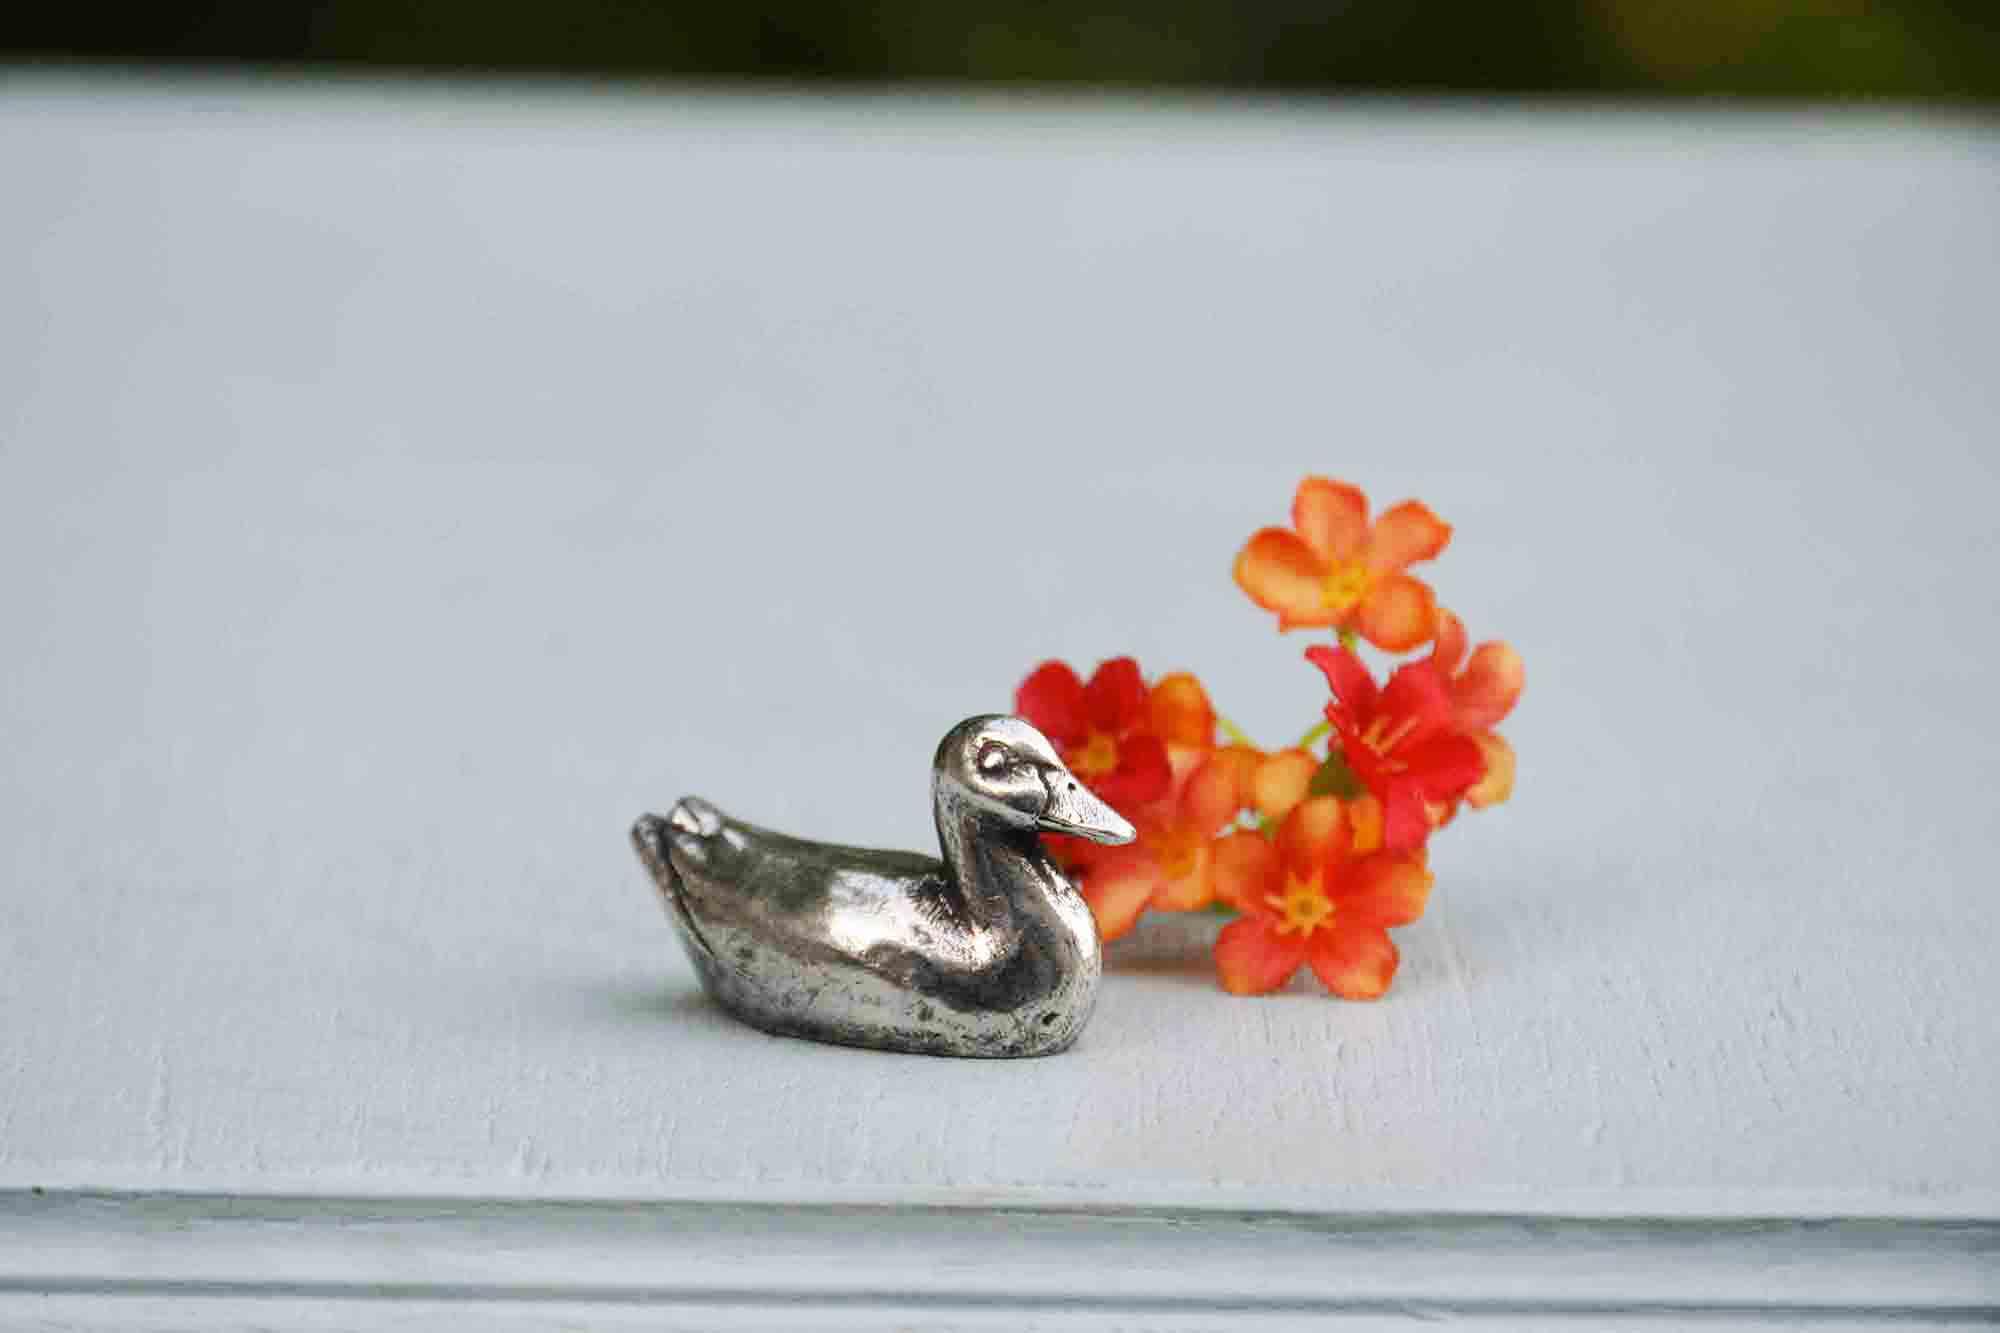 Canard mini etain aspect argent massif